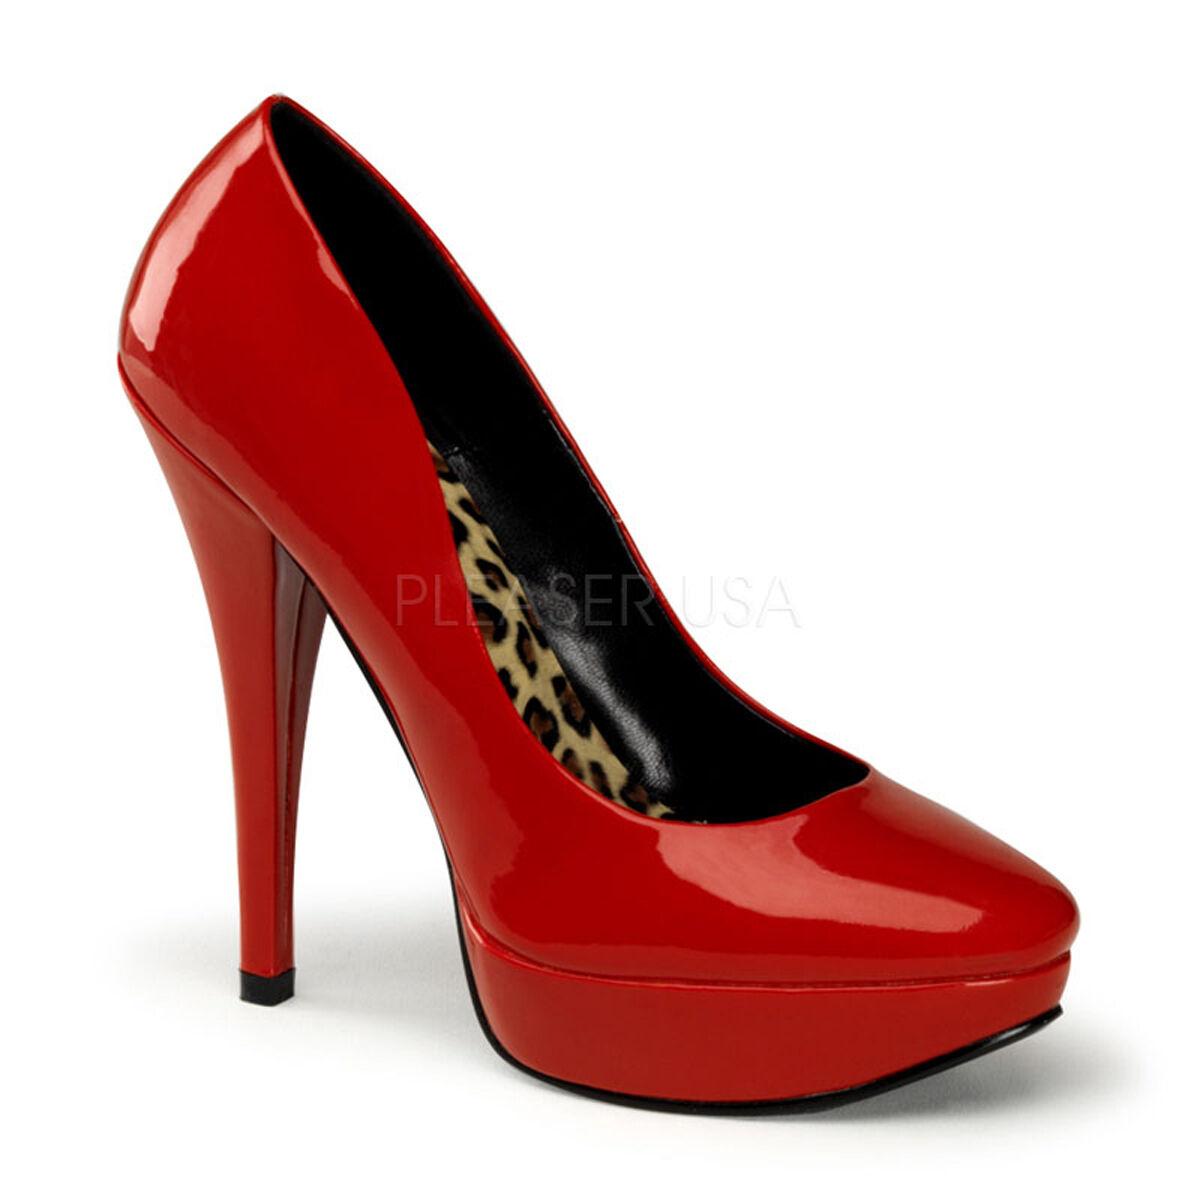 PINUP HARL01/RPT Platform Sexy Red Shoes Retro Stiletto High Heels Platform HARL01/RPT Pumps a4ef1b